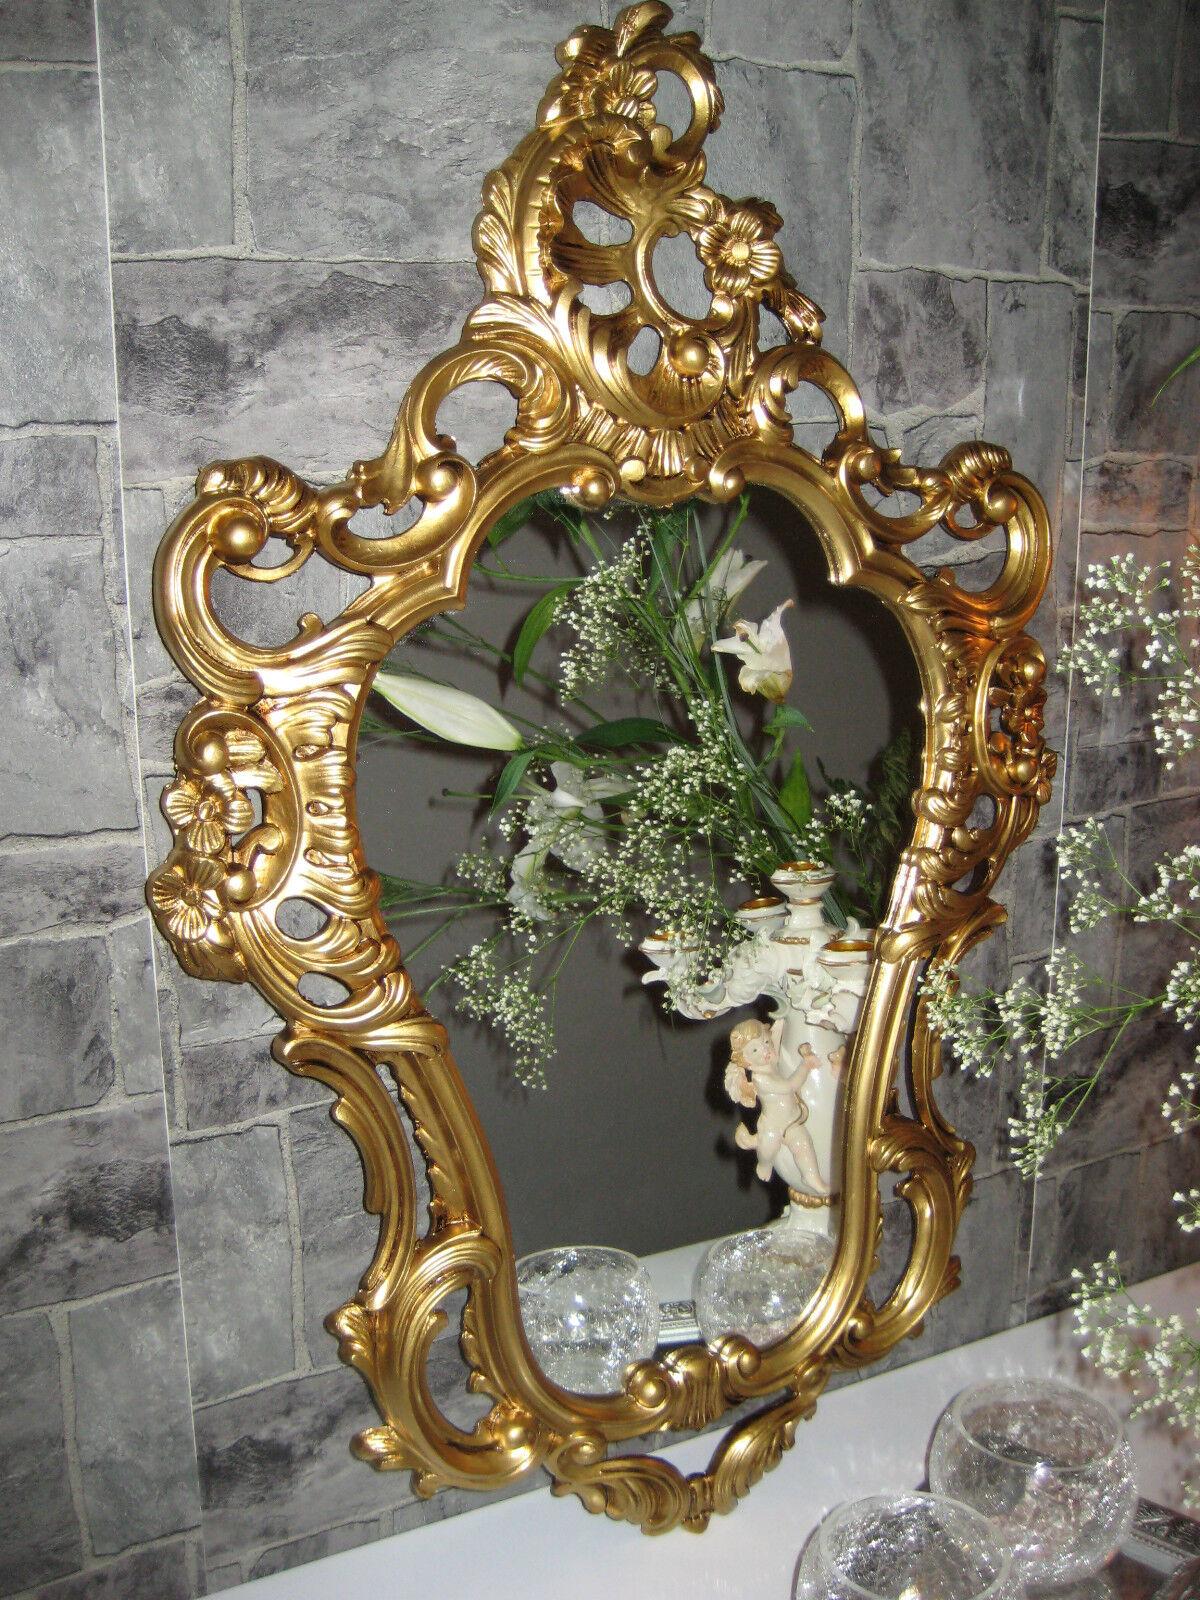 Espejo de parojo Dorado Antiguo en estilo moderno baño Barroco 50x76 NUEVO